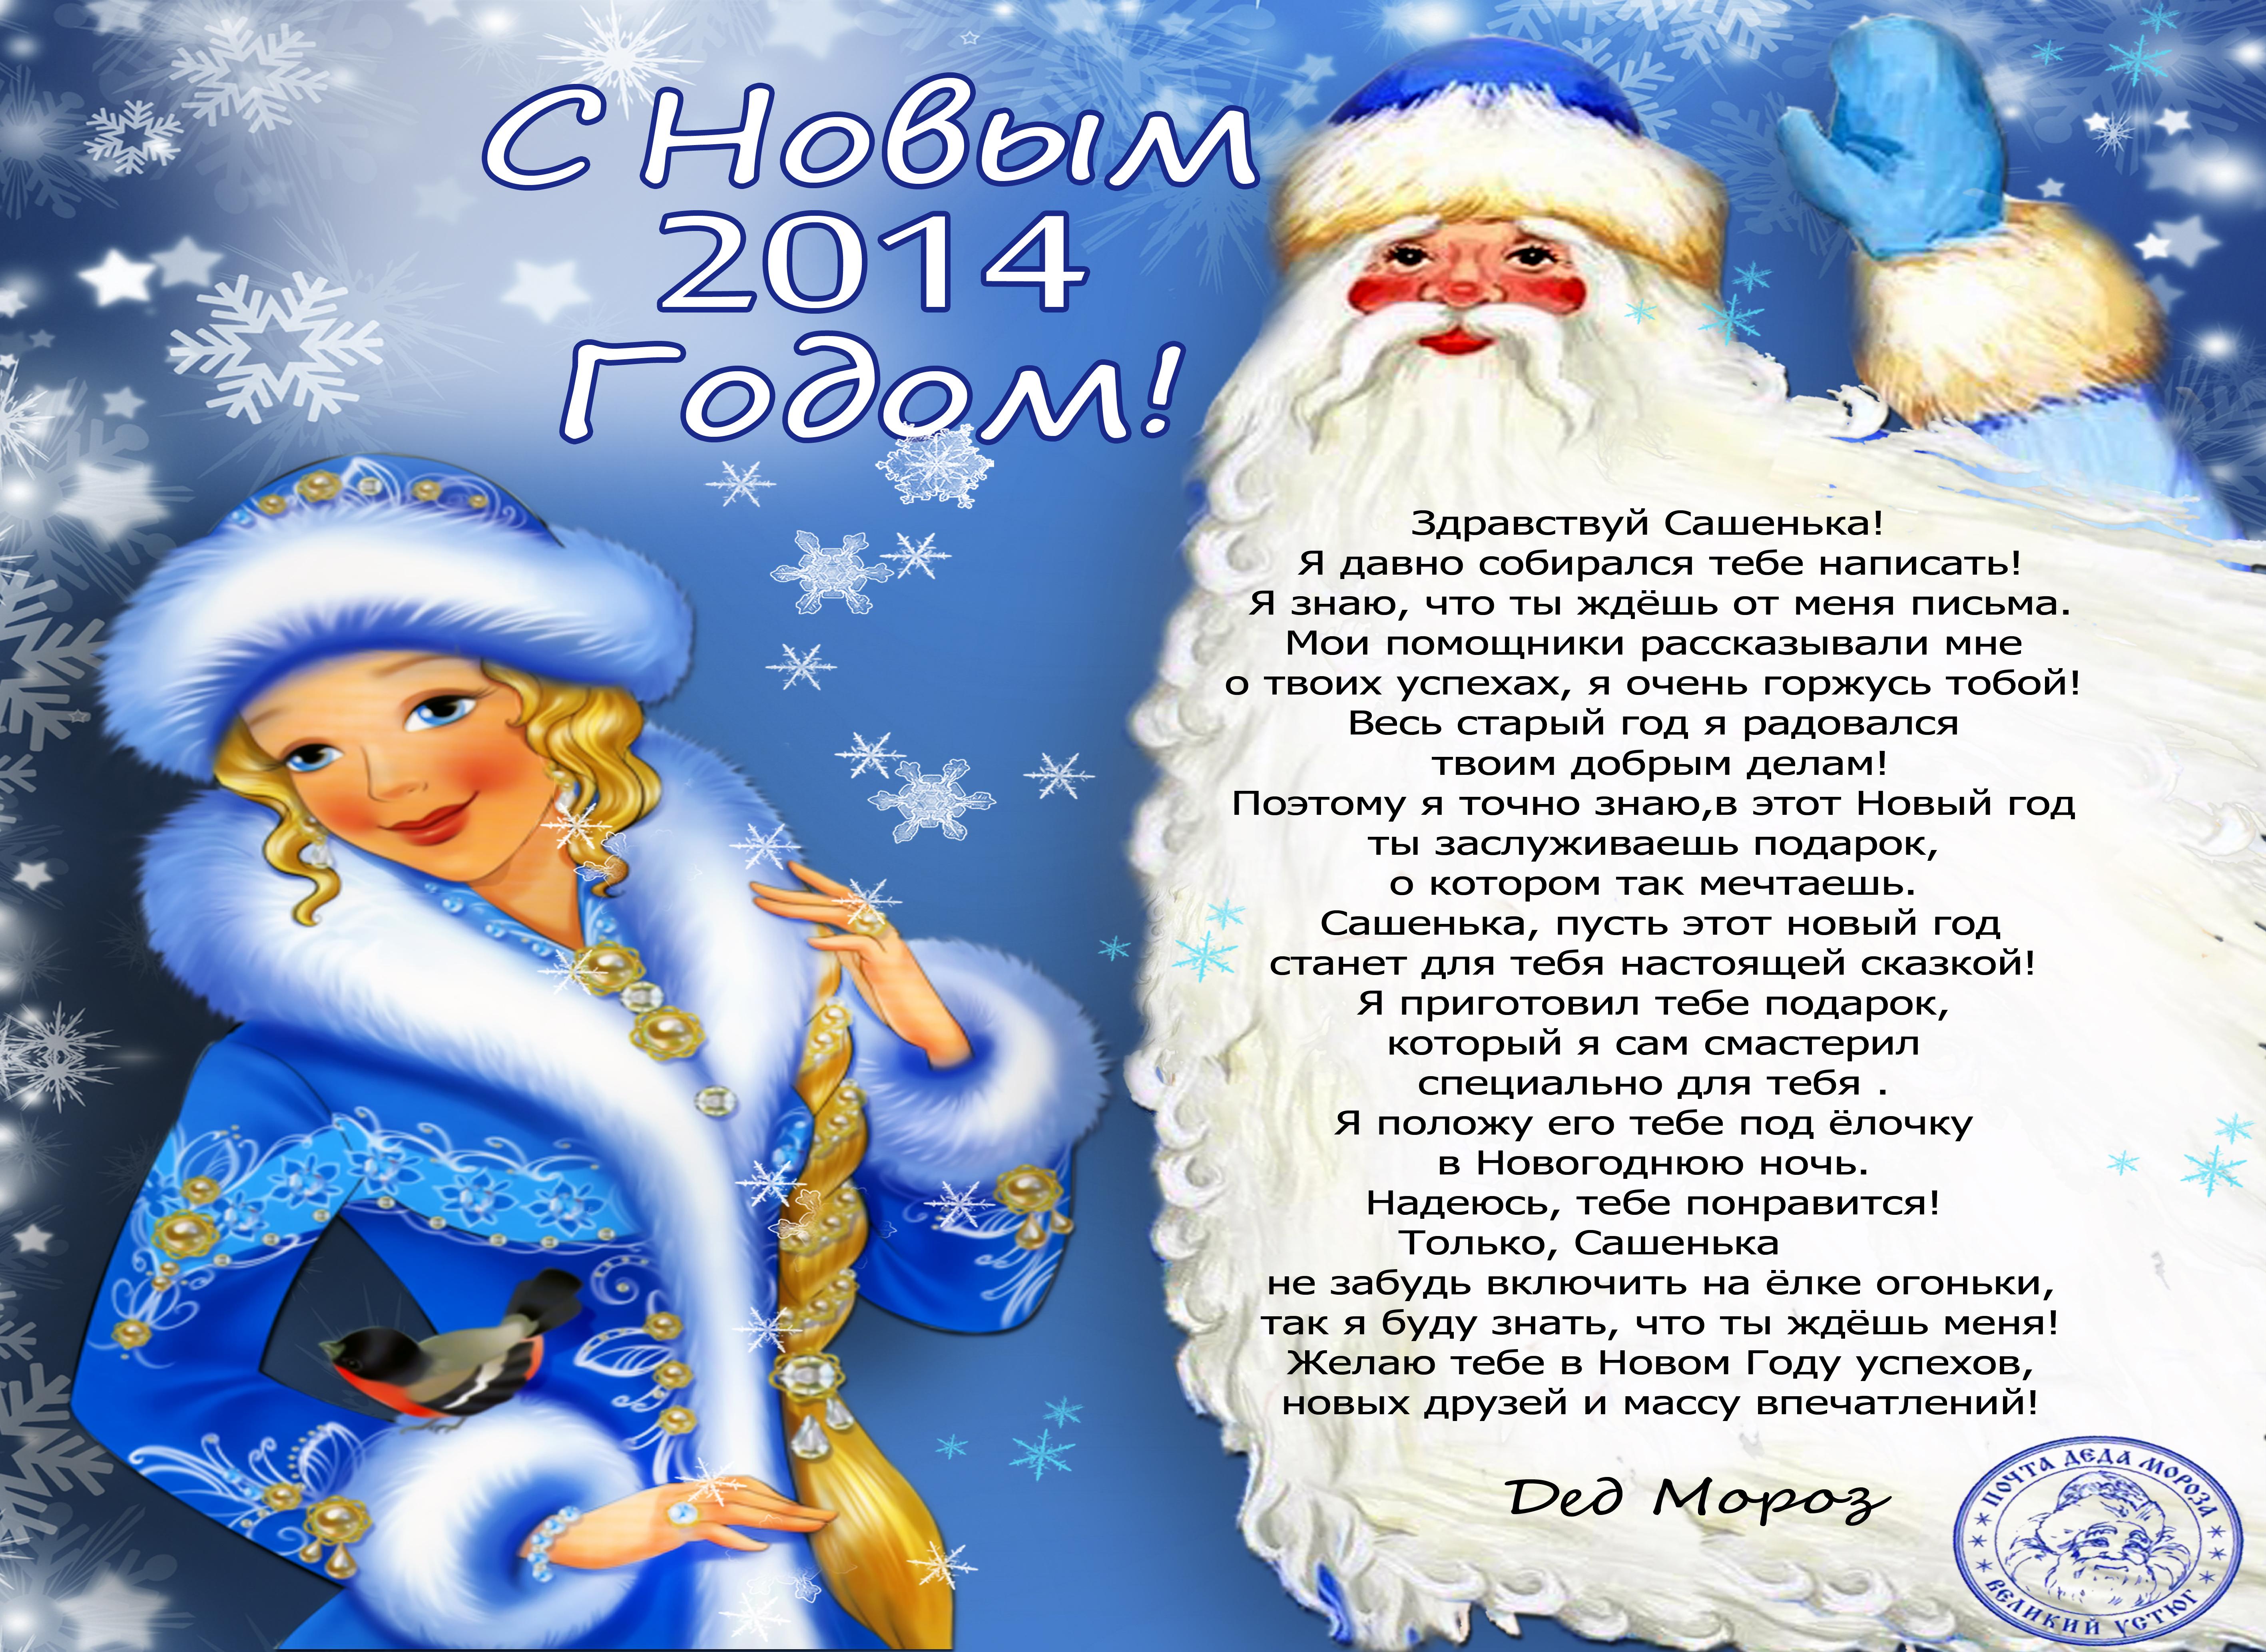 Рецепты огурцов на зиму в мультиварке